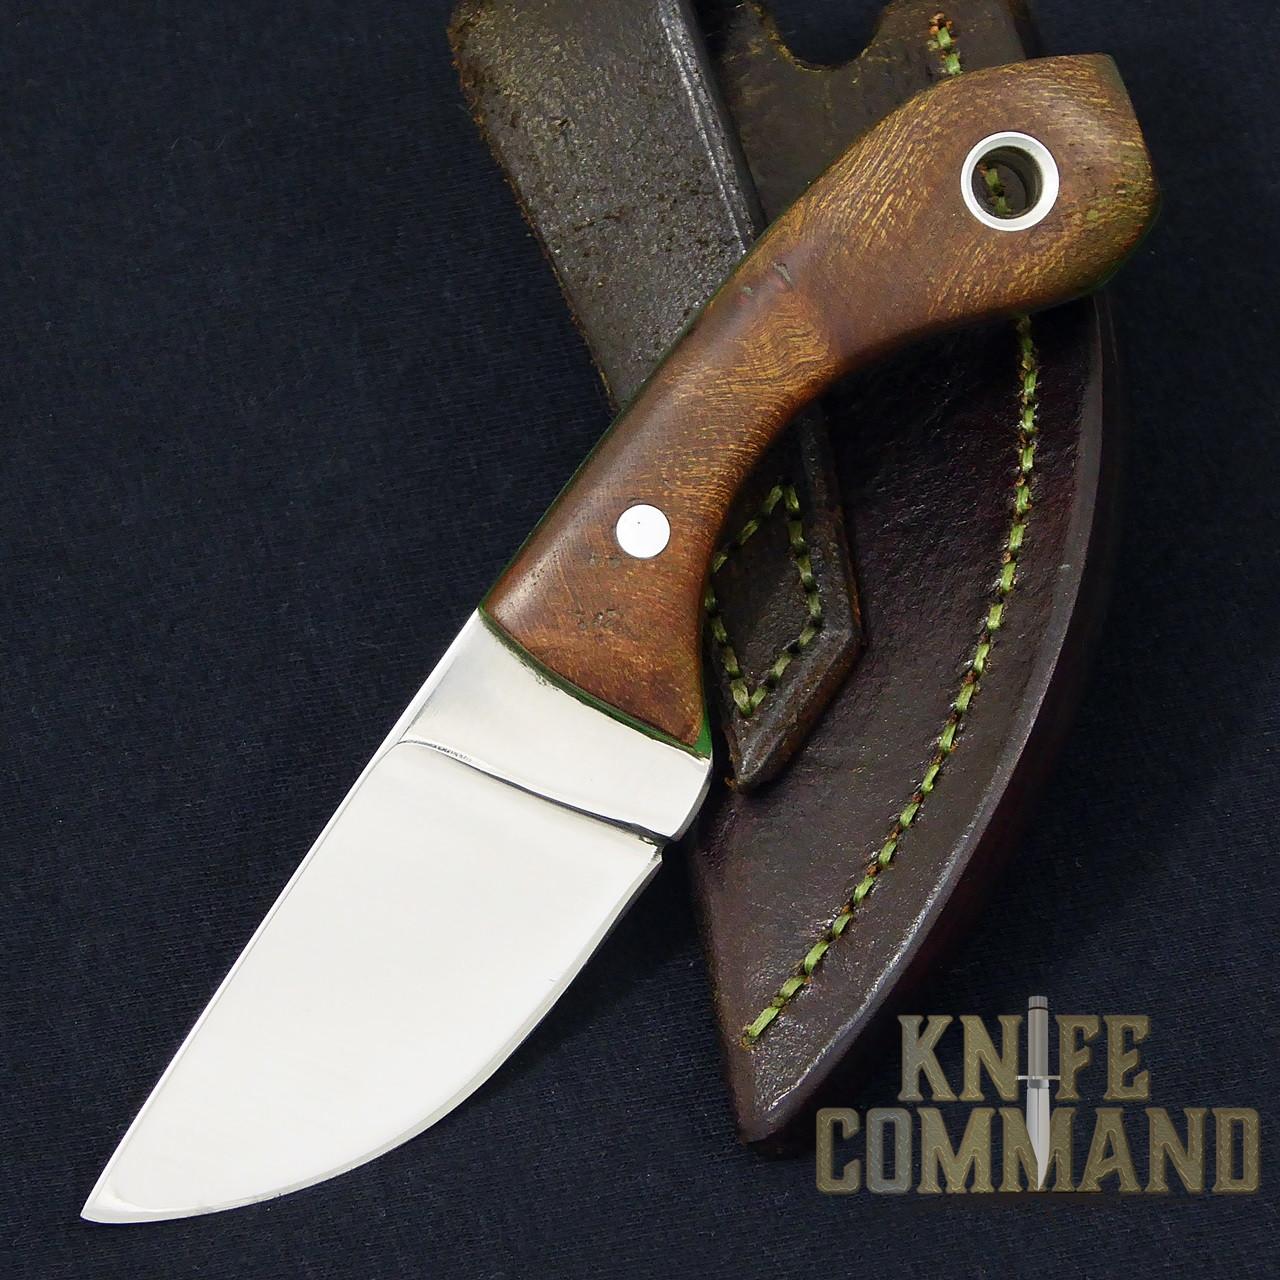 Paddy Smyth Knives Irish Elm Knife, The Leprechaun.  Comes with sheath and lanyard.